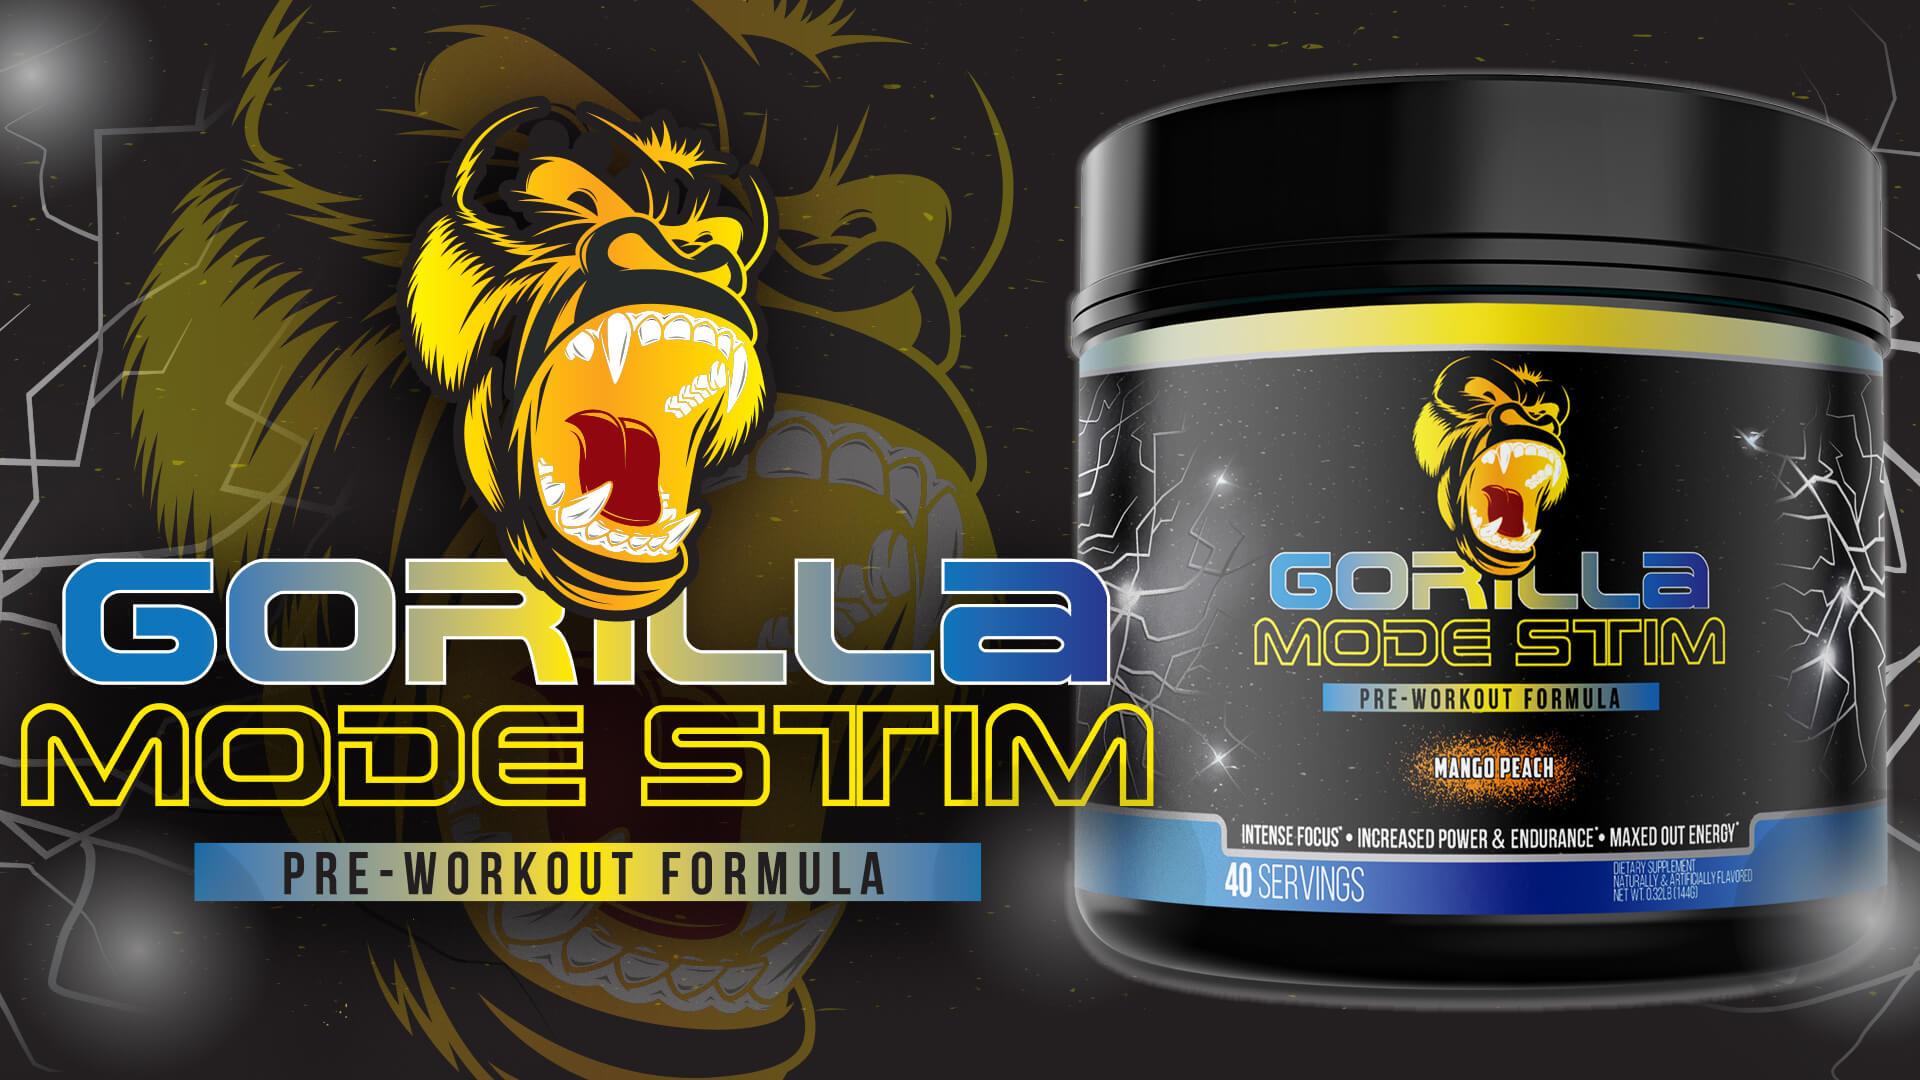 Moreplatesmoredates.com Gorilla Mode Stim Energy Formula Full Product Breakdown